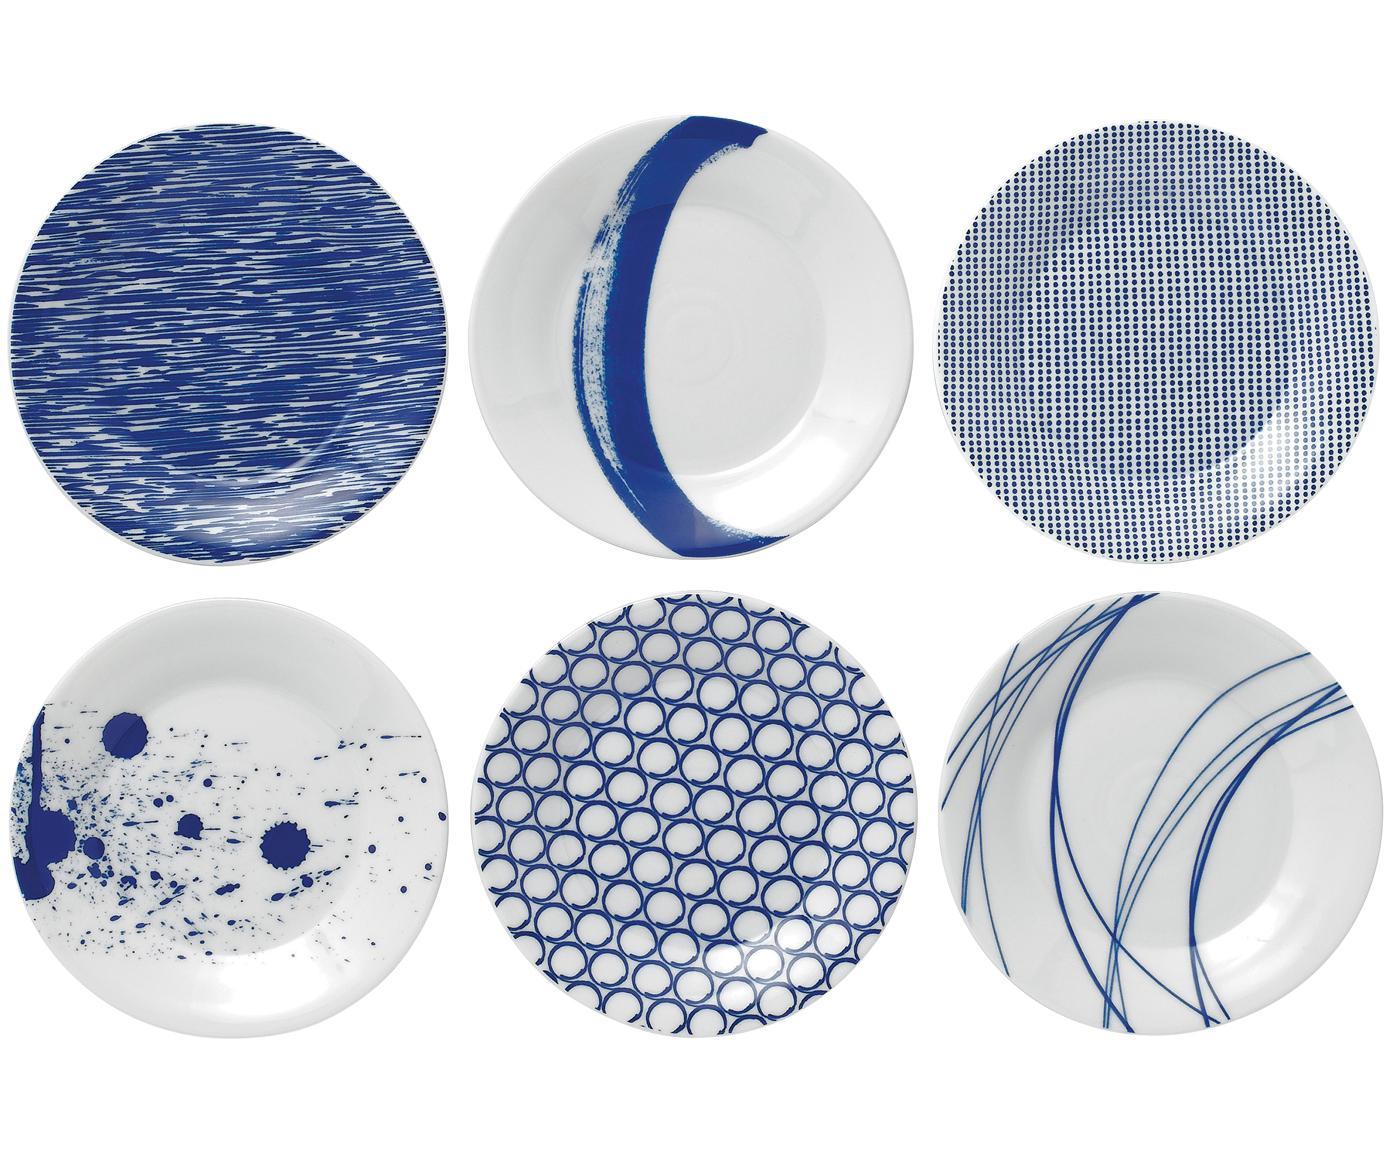 Gemusterte Porzellan-Brotteller Pacific, 6er-Set, Porzellan, Weiß, Blau, Ø 16 cm